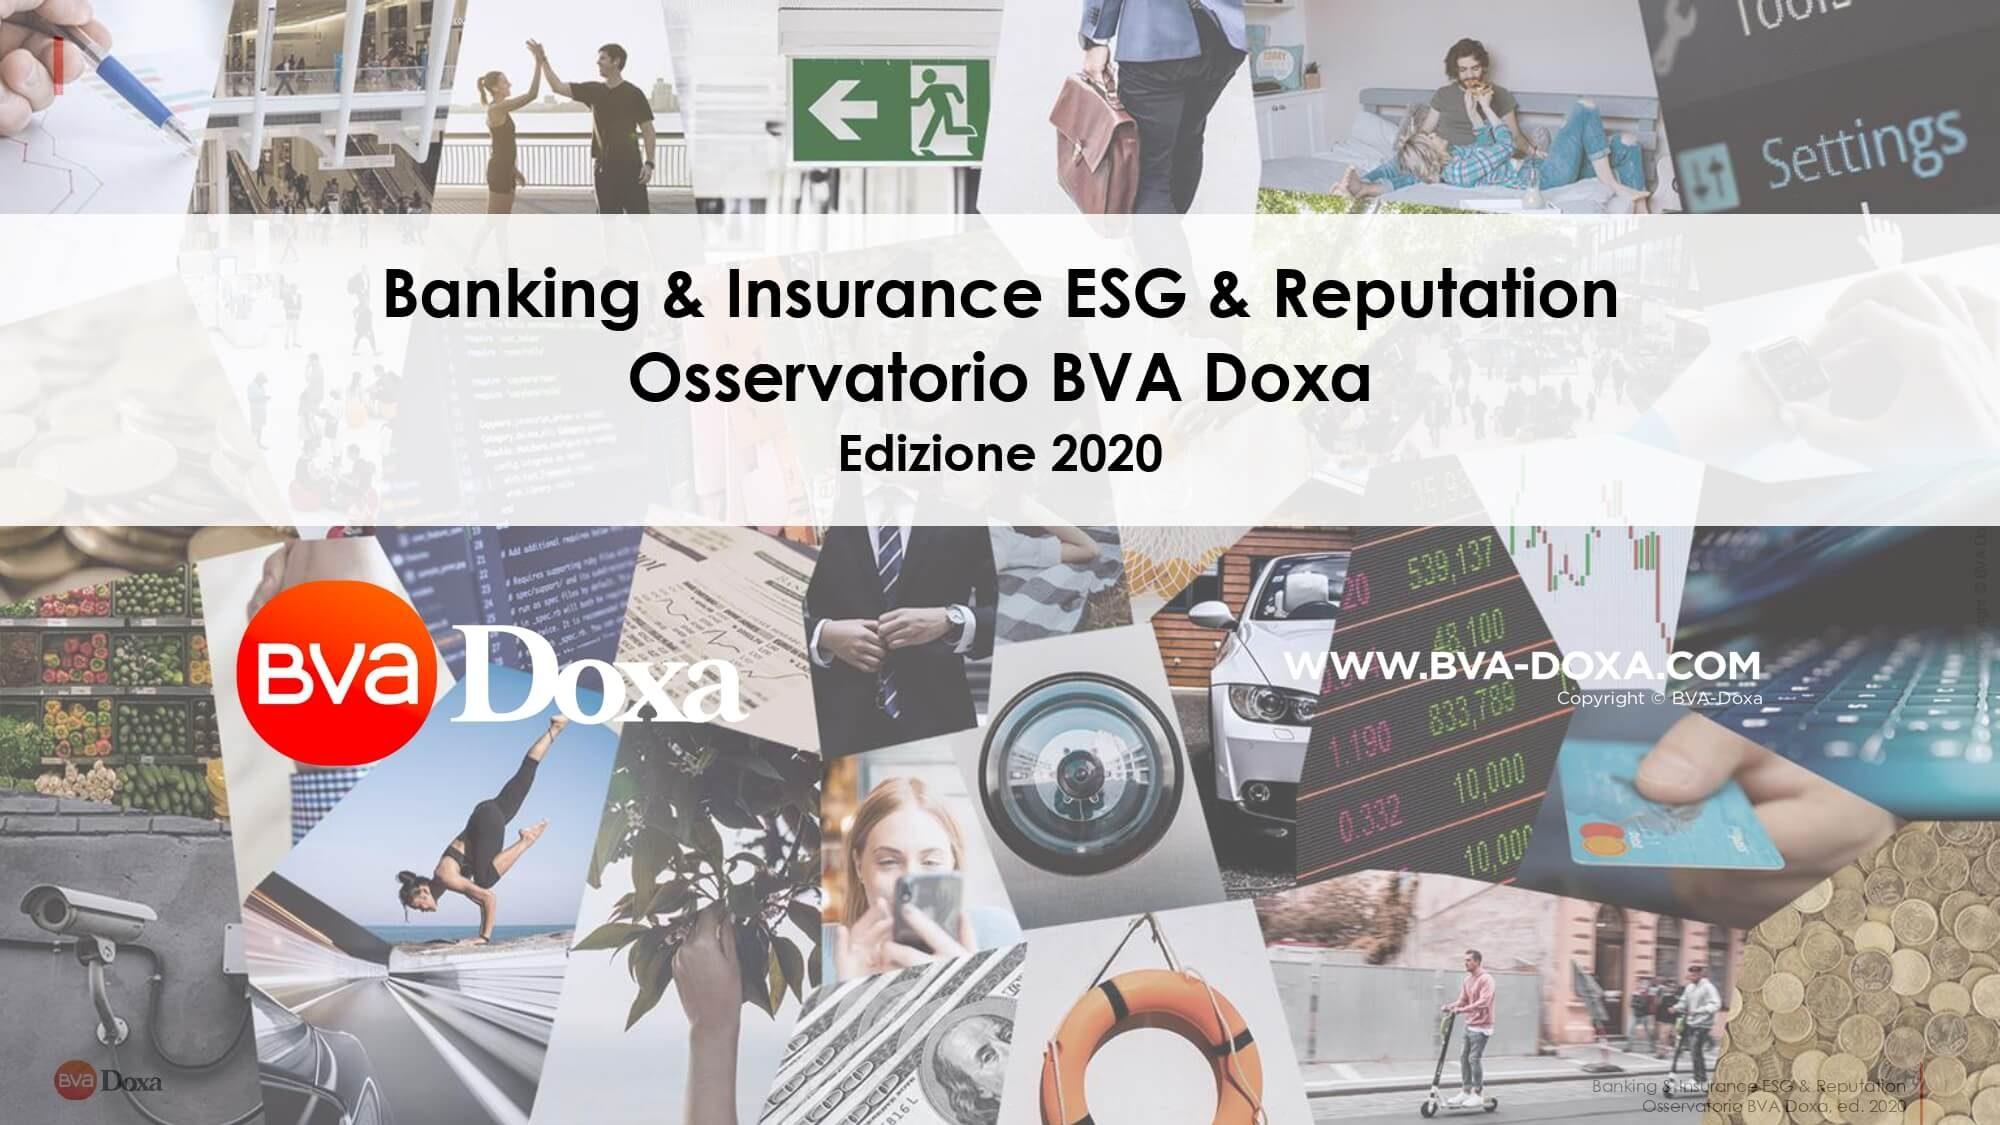 Bva Doxa Banking & Insurance Esg & Reputation Page 0001